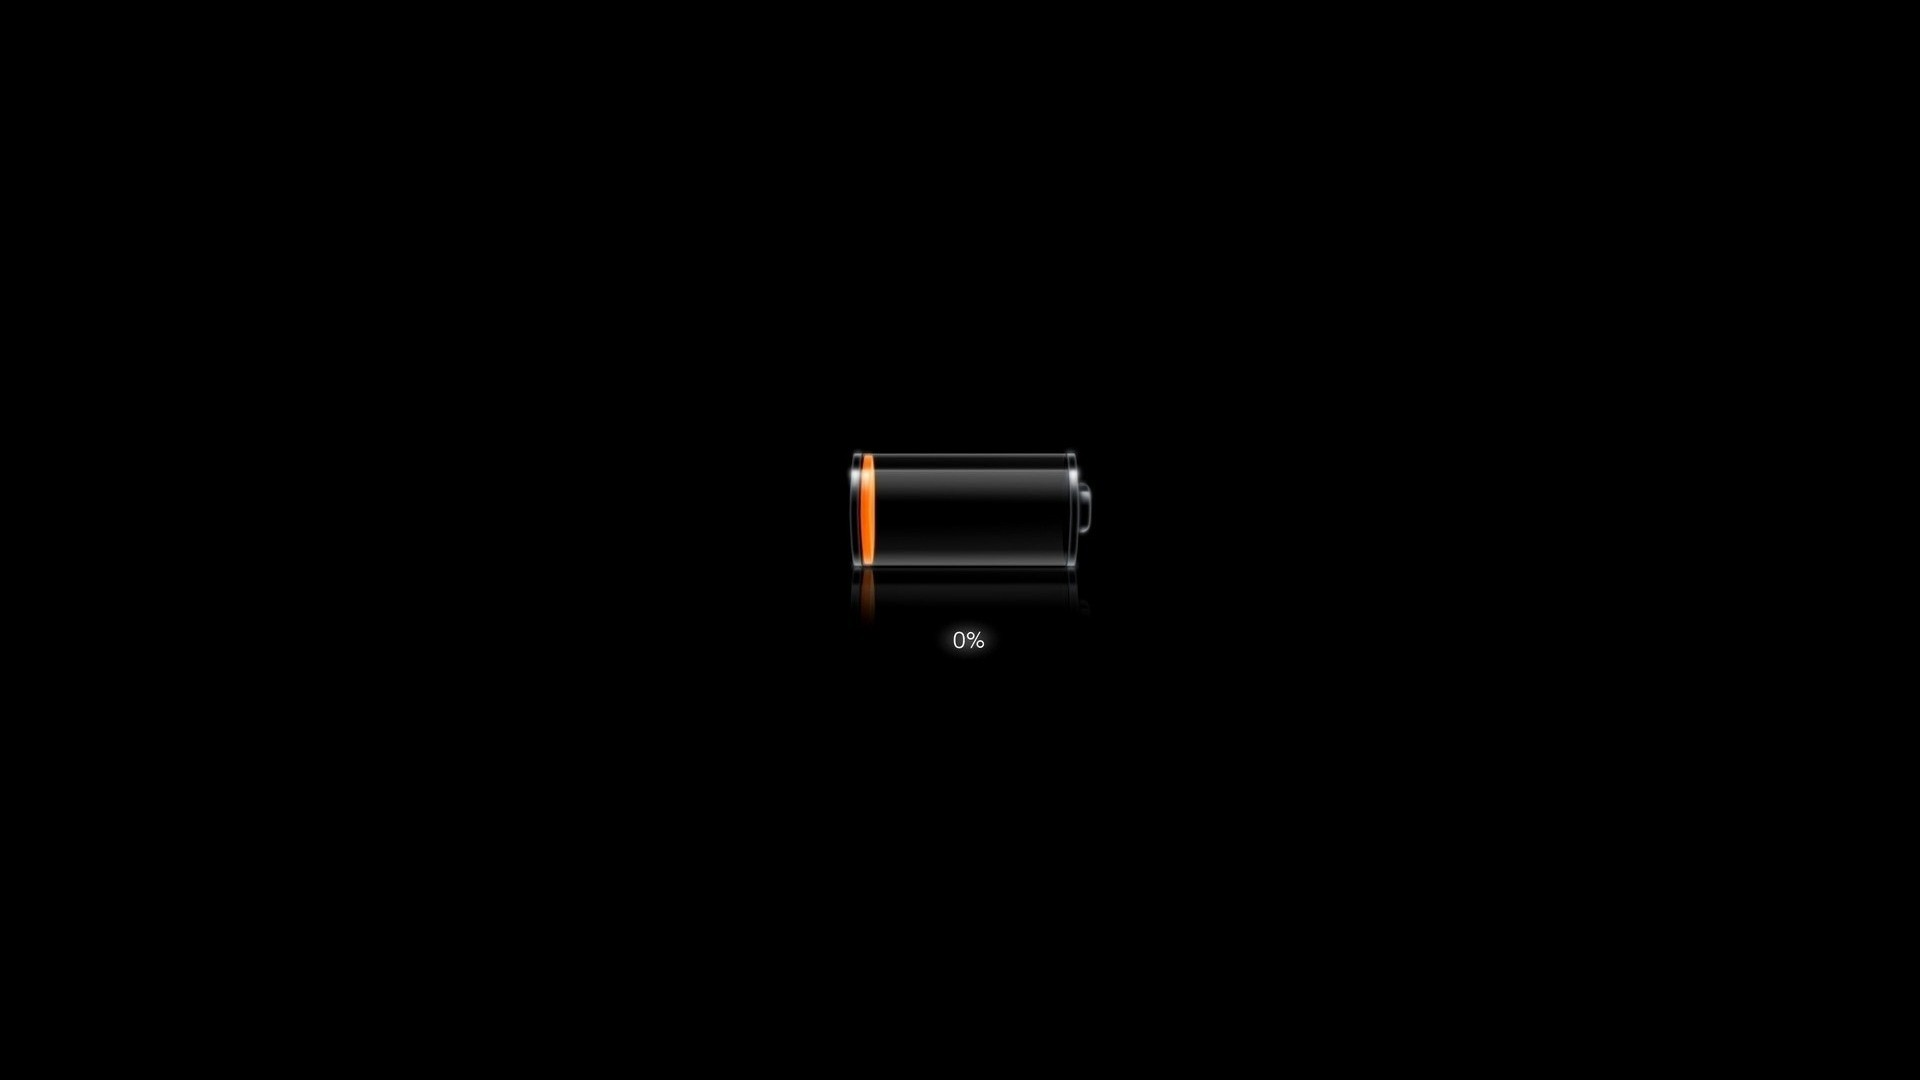 Dark Battery Charging